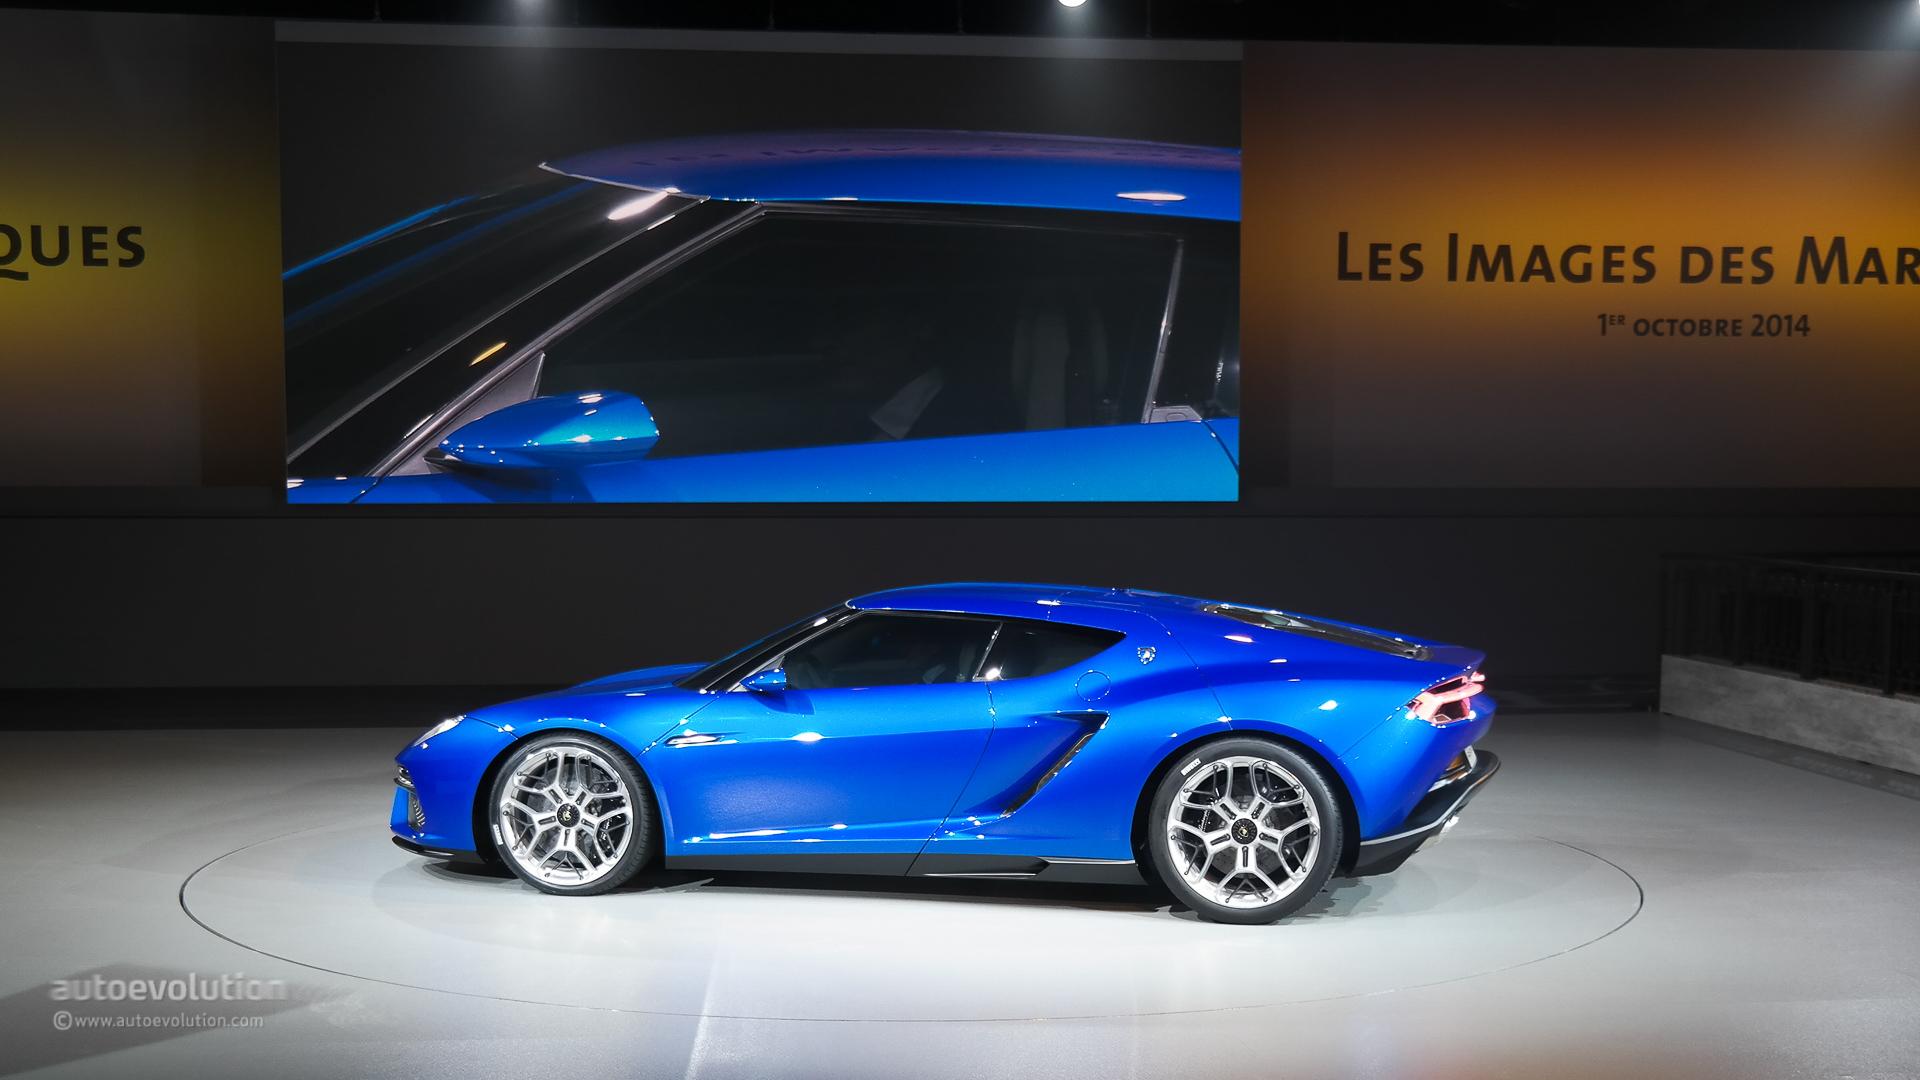 Lamborghini Asterion Lpi 910 4 Looks Like An Estoque Evora Mashup Live Photos Autoevolution